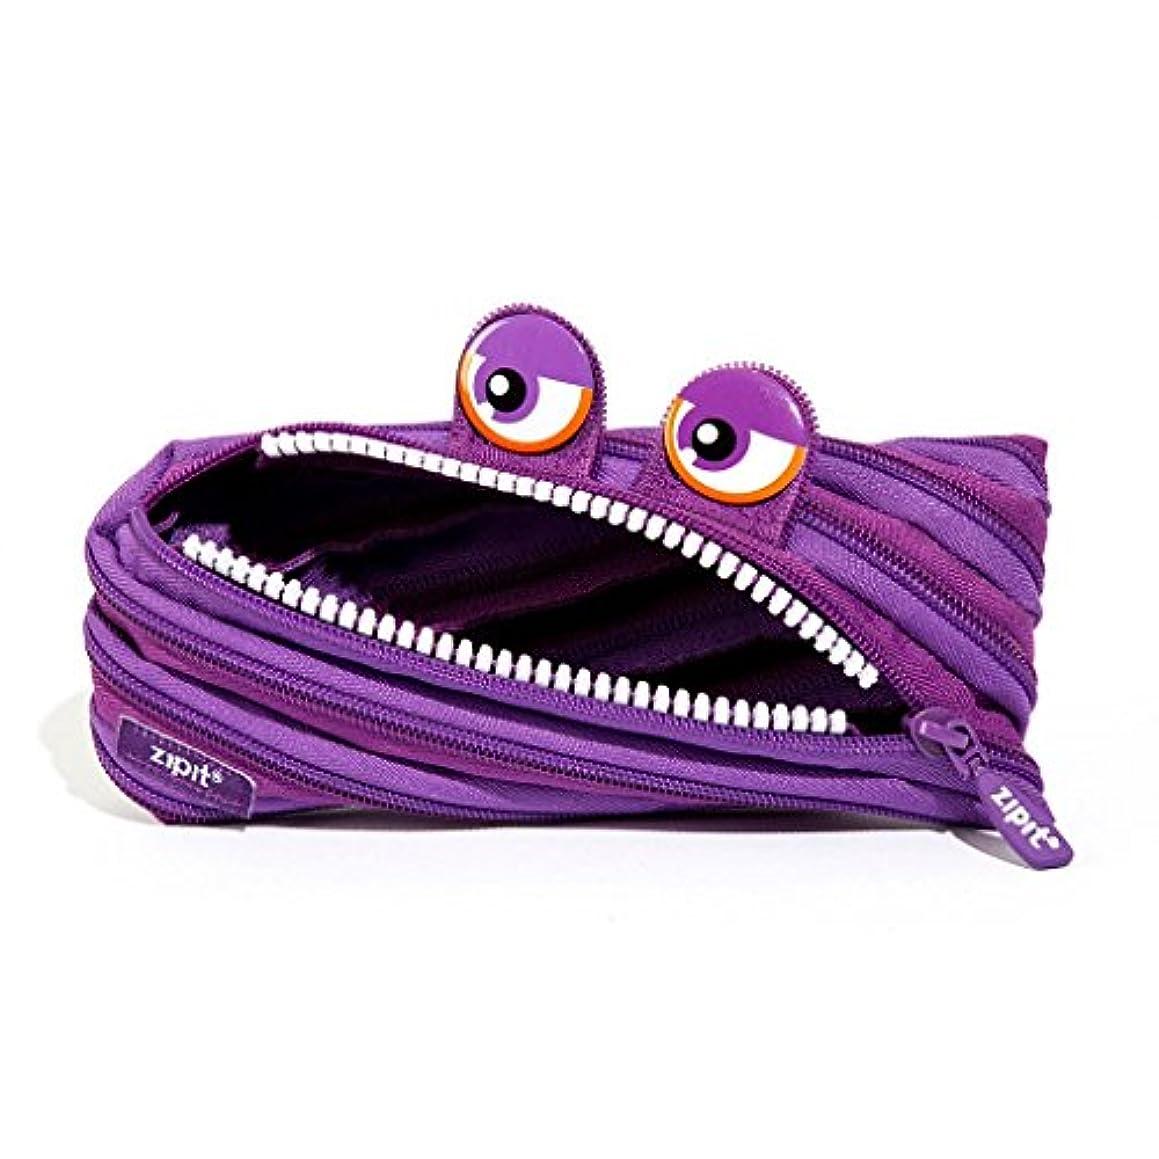 ZIPIT Wildlings Pencil Case/Cosmetic Makeup Bag, Purple